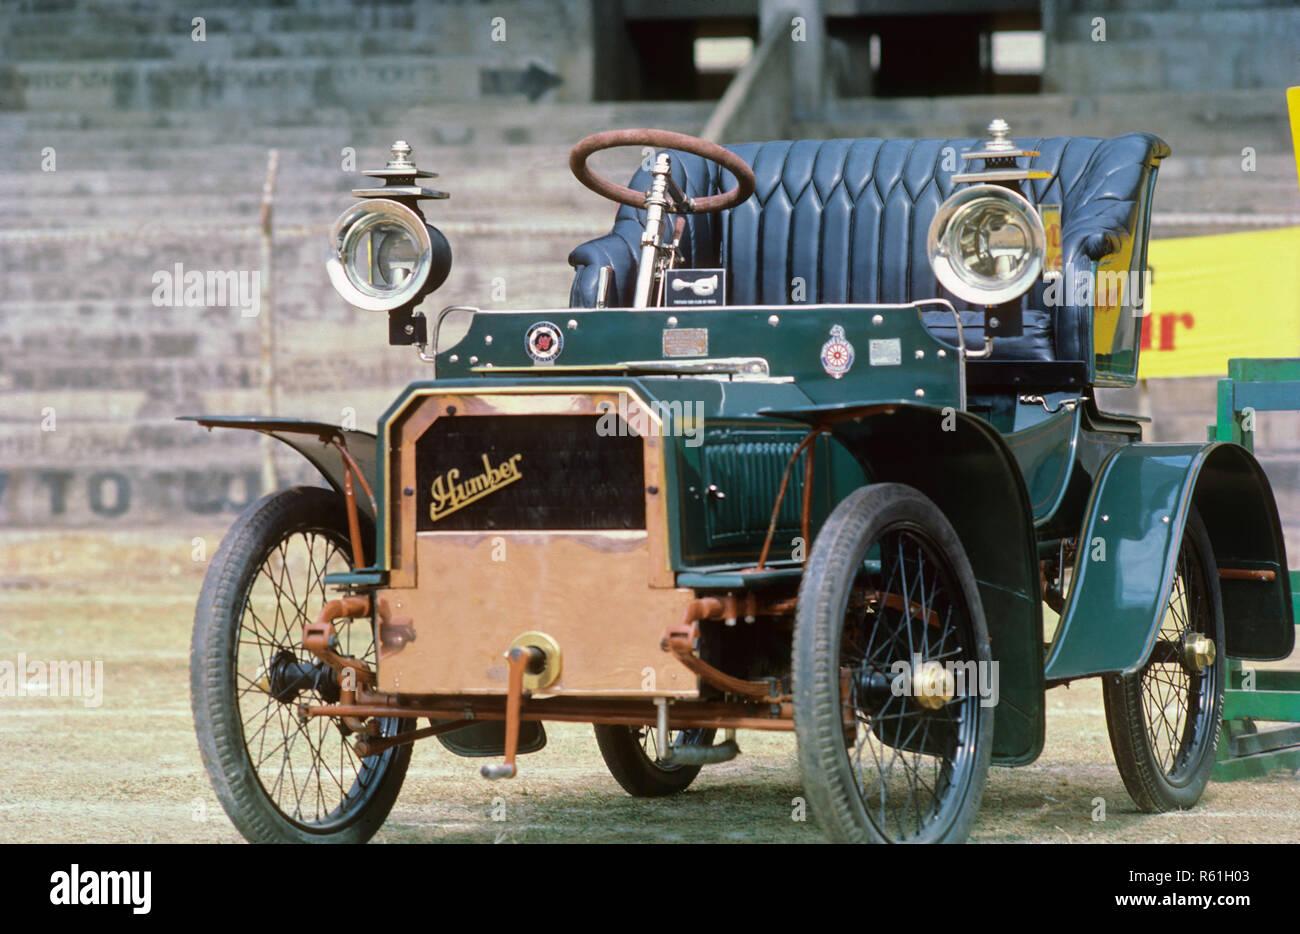 Vintage Car - Stock Image